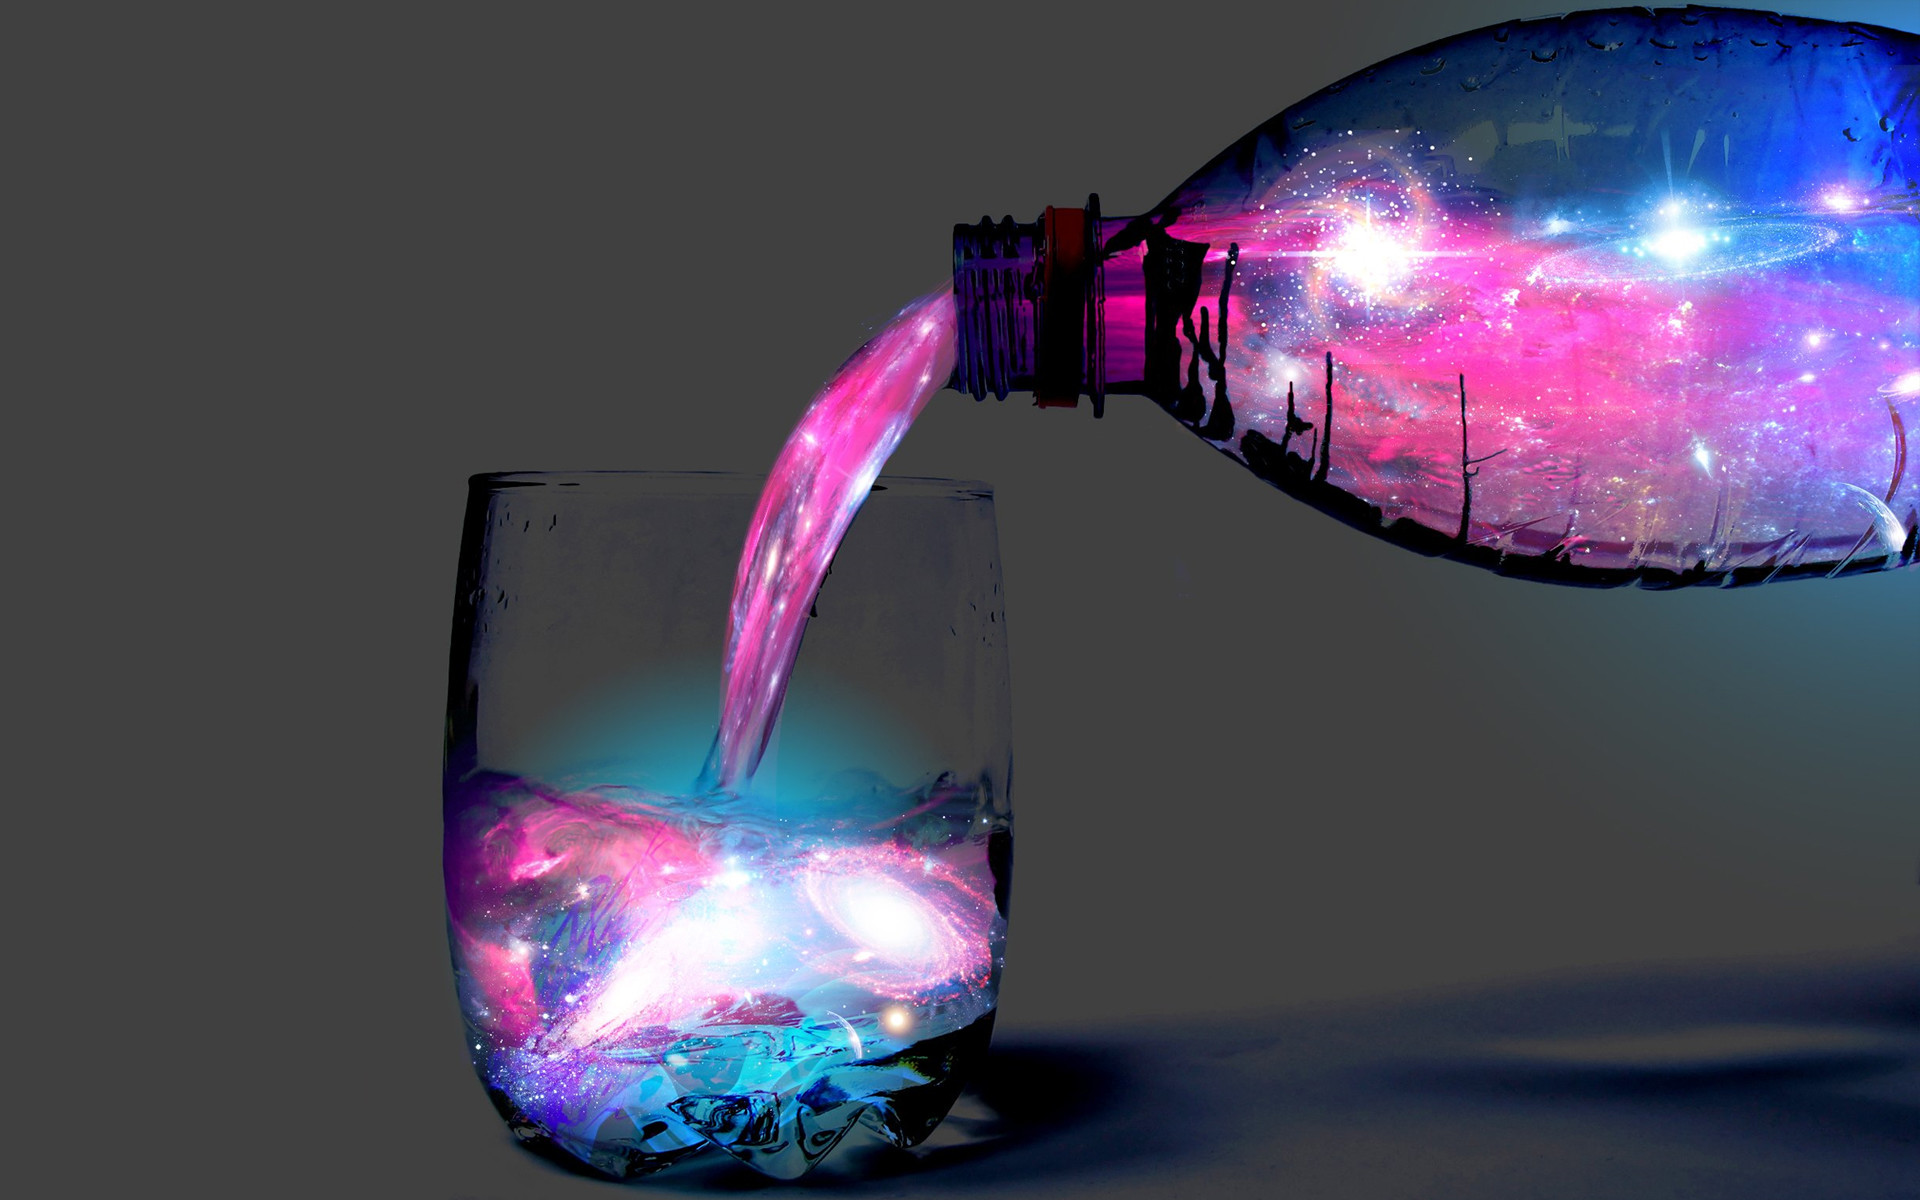 Free Galaxy Water Bottle Wallpapers, Free Galaxy Water Bottle HD Wallpapers,  Galaxy Water Bottle Desktop Wallpapers, Galaxy Water Bottle Desktop  Backgrounds